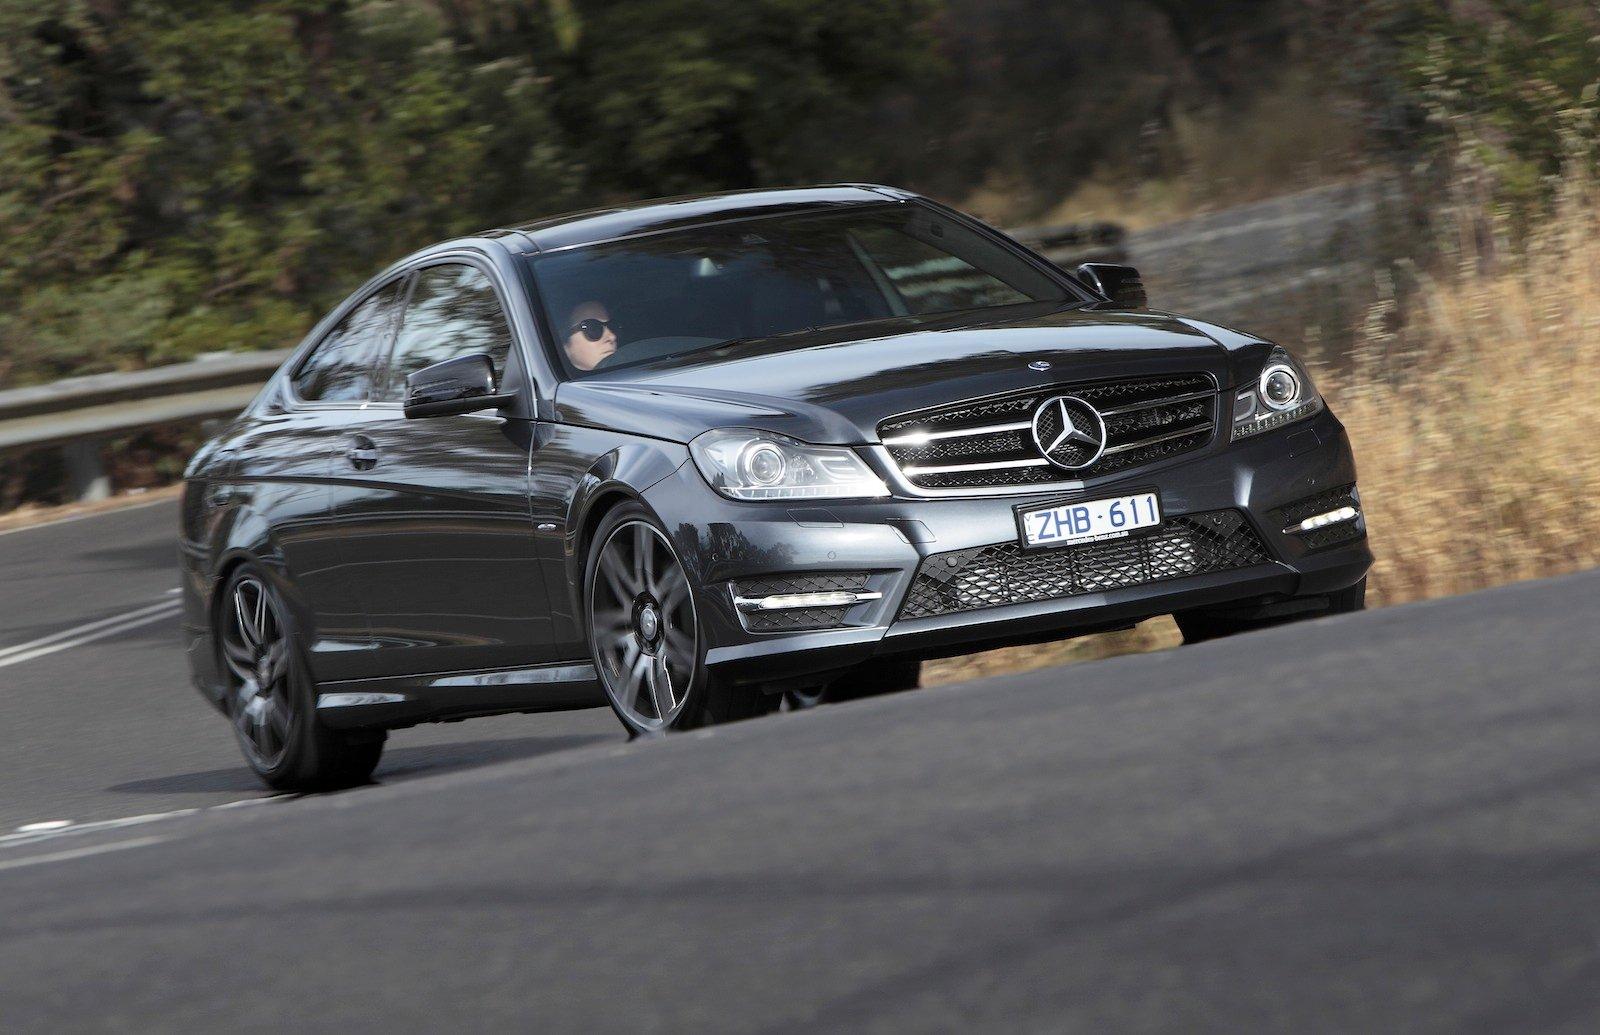 Mercedes Benz C250 Coupe Sport Review Photos Caradvice